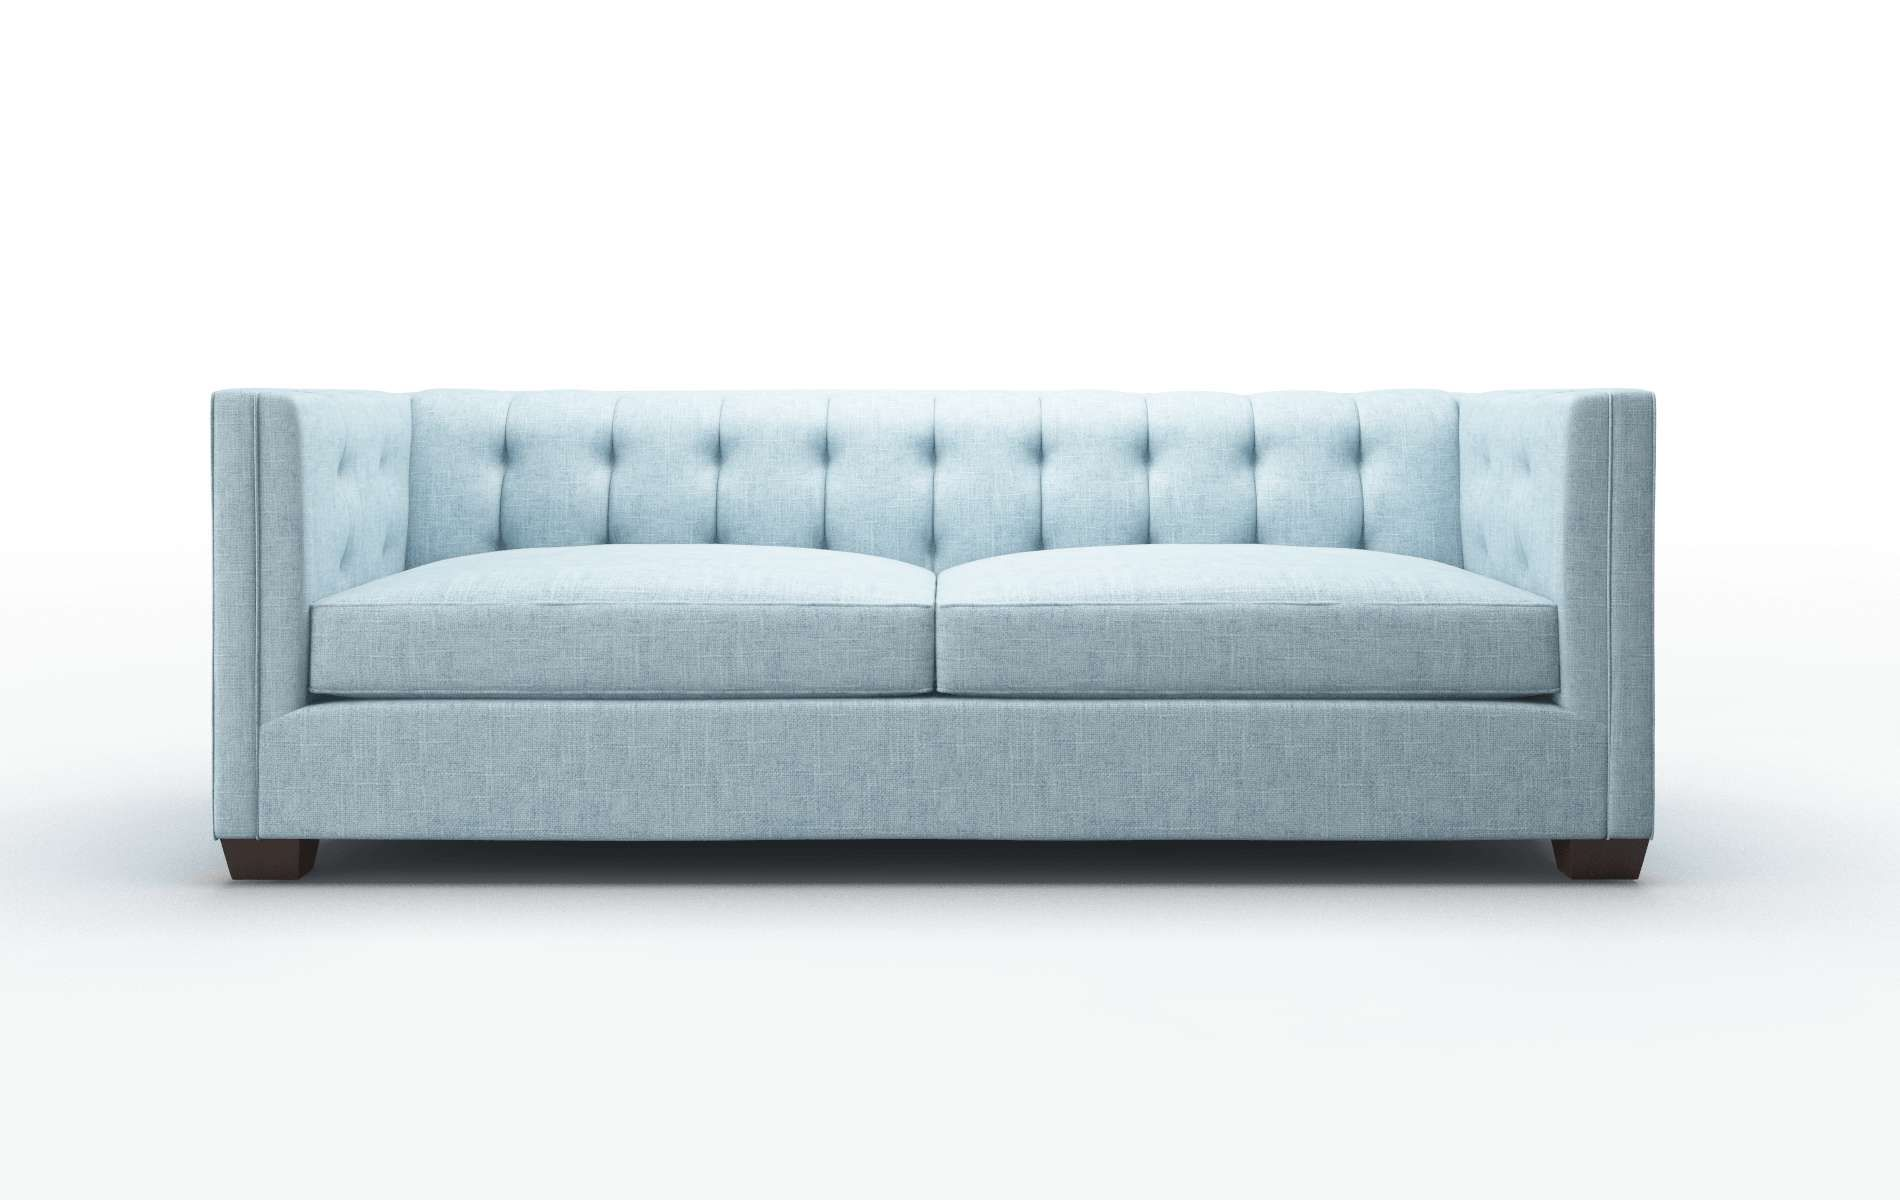 Harper Bella Caribbean Sofa In 2020 With Images Turquoise Sofa Cool Furniture Sofa